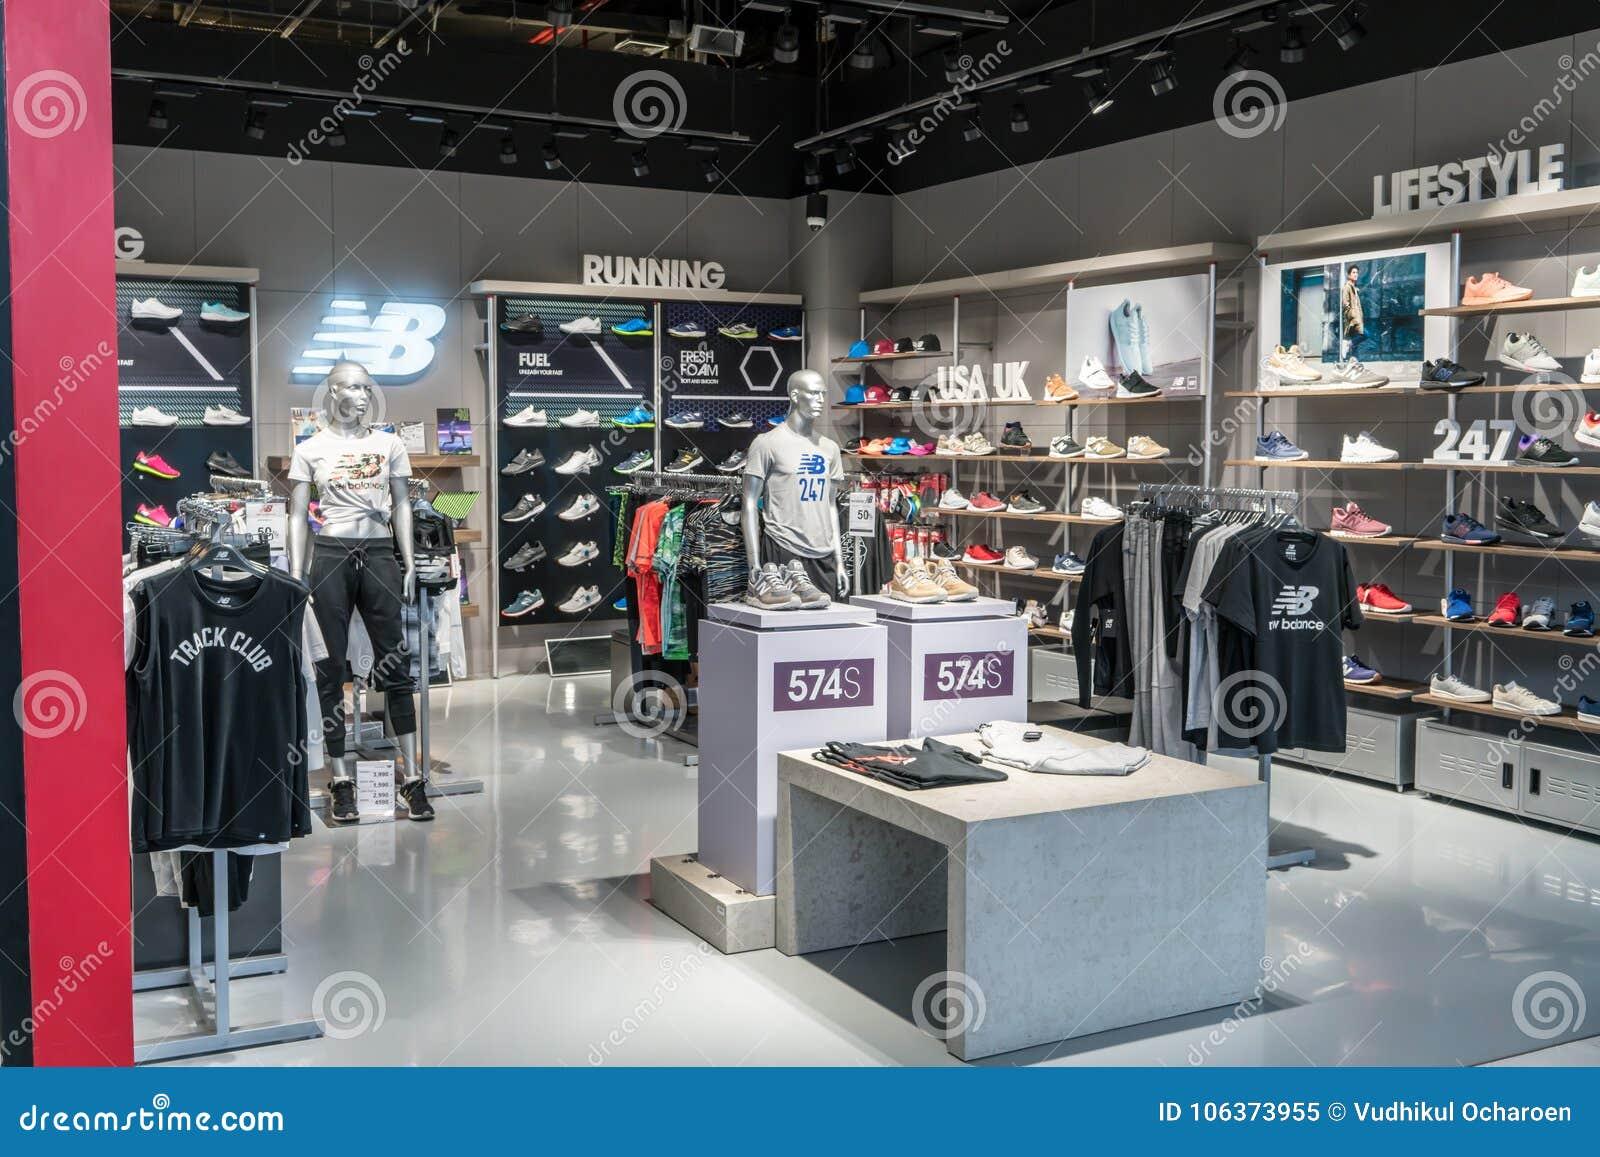 boutique new balance cheap online